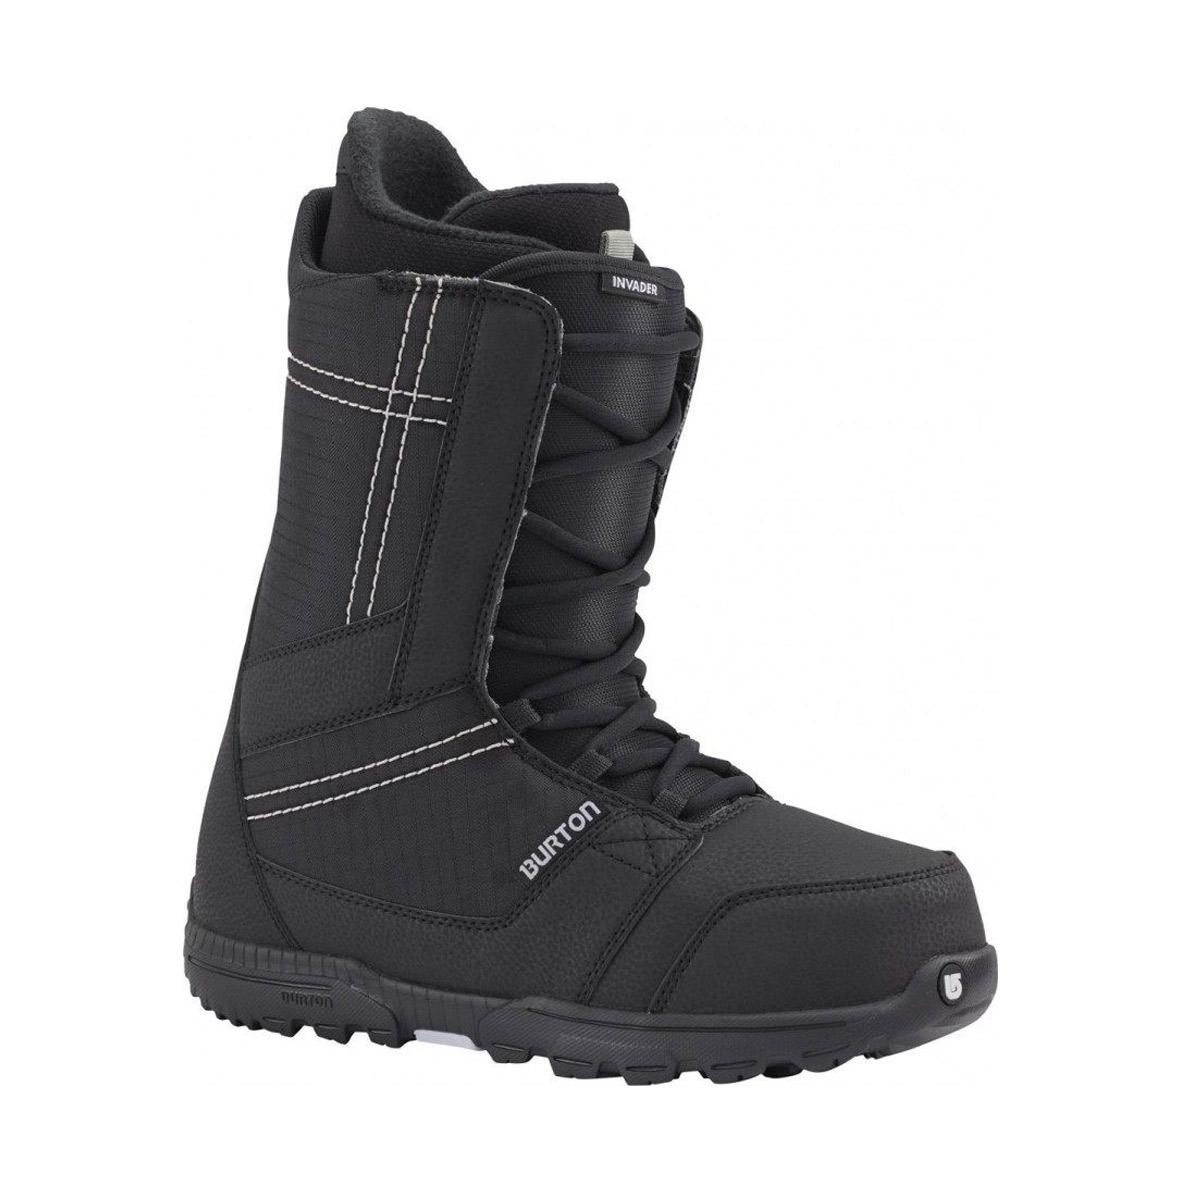 Ботинки для сноуборда BURTON Invader Black 2017/2018